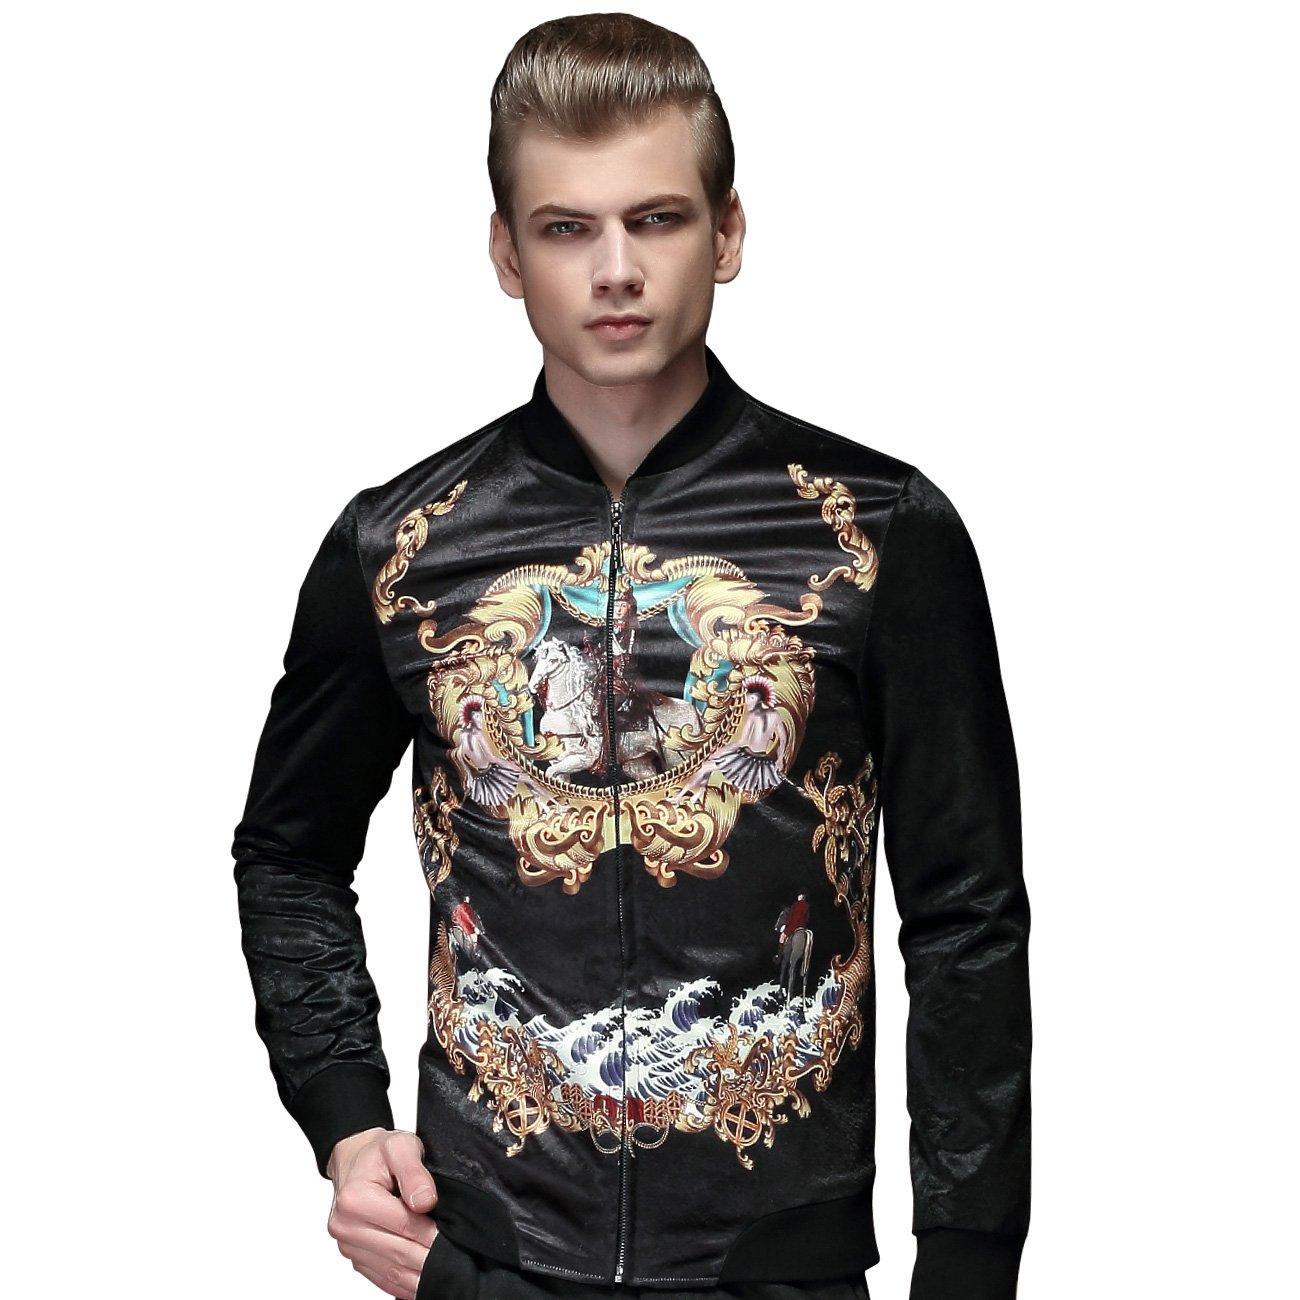 FANZHUAN Spring Mens Fashion Black Printed Jacket Faux Horse Fur Material Slim Fit 15006